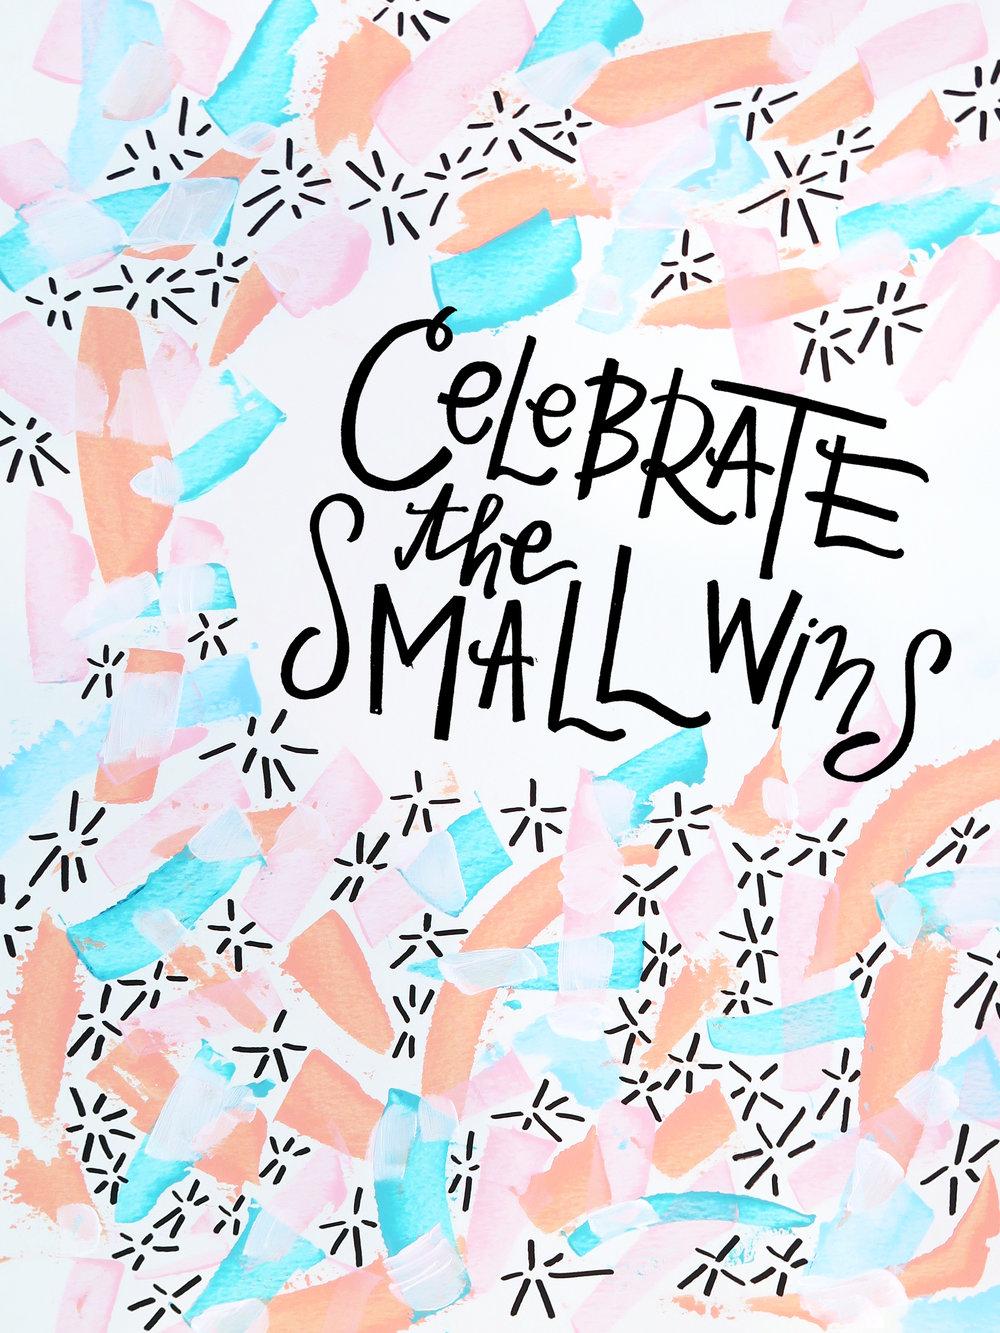 3/28/16: Celebrate